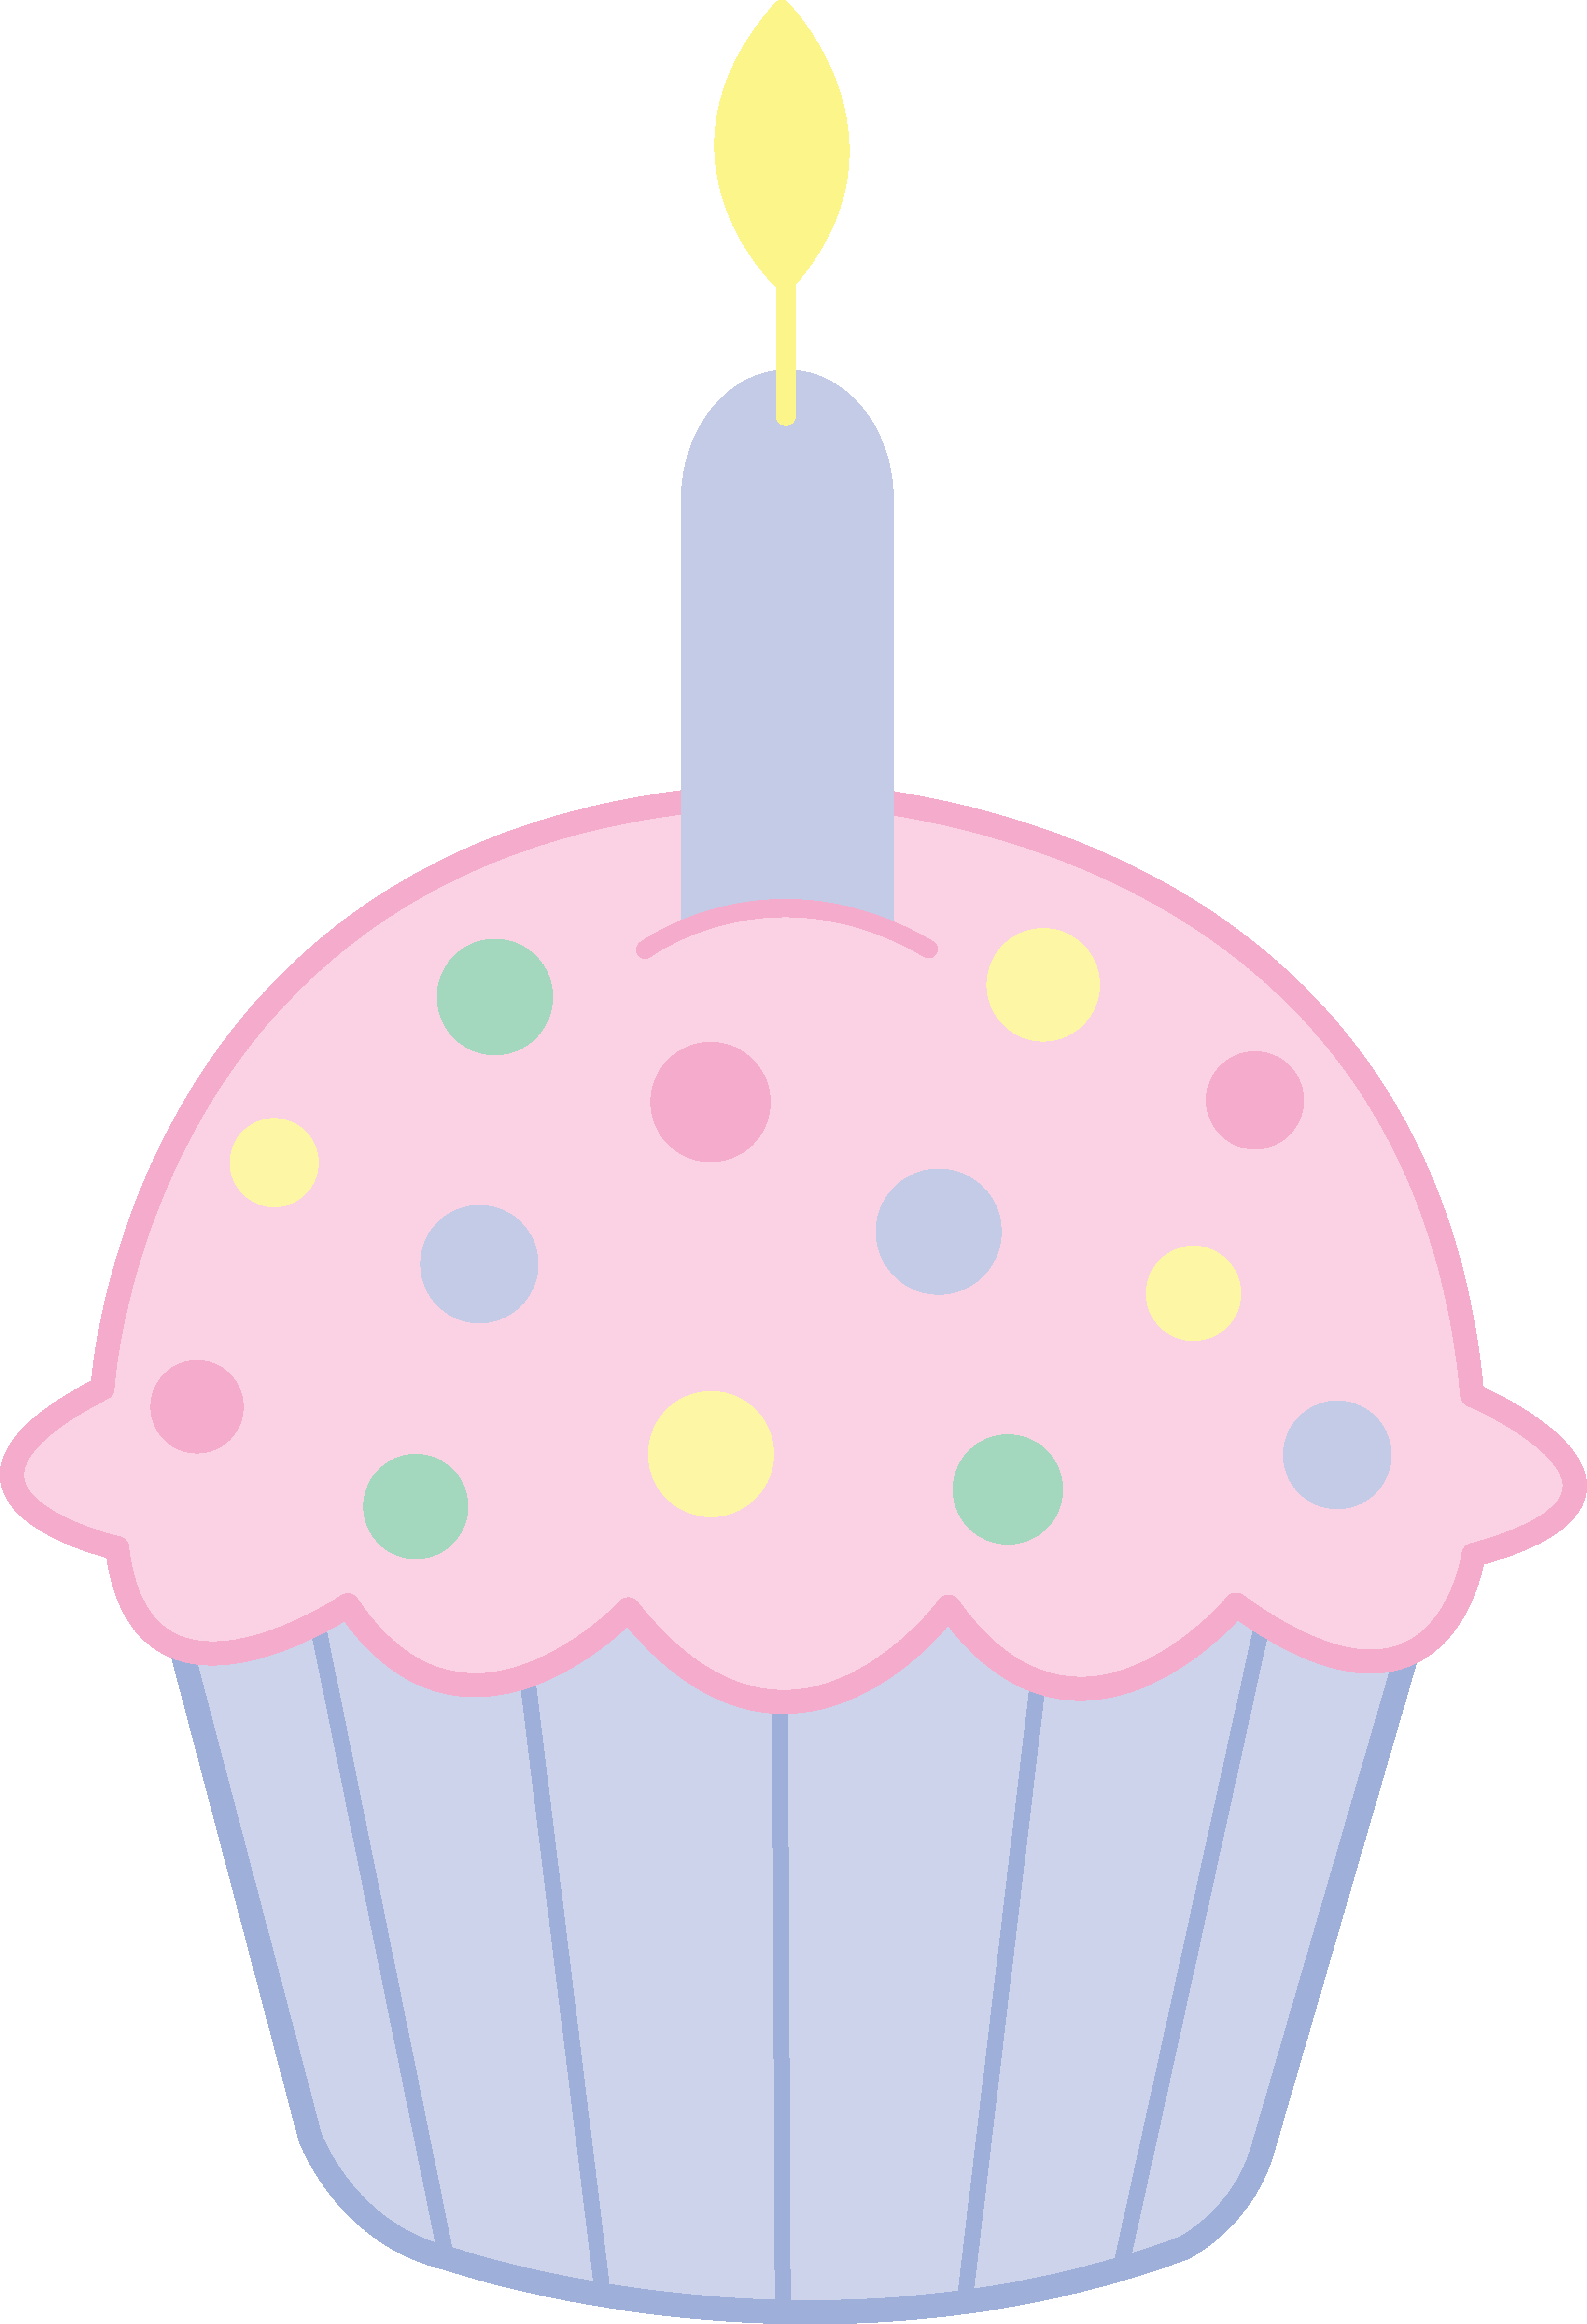 Cupcake clipart ladybug. Birthday printables pinterest birthdays